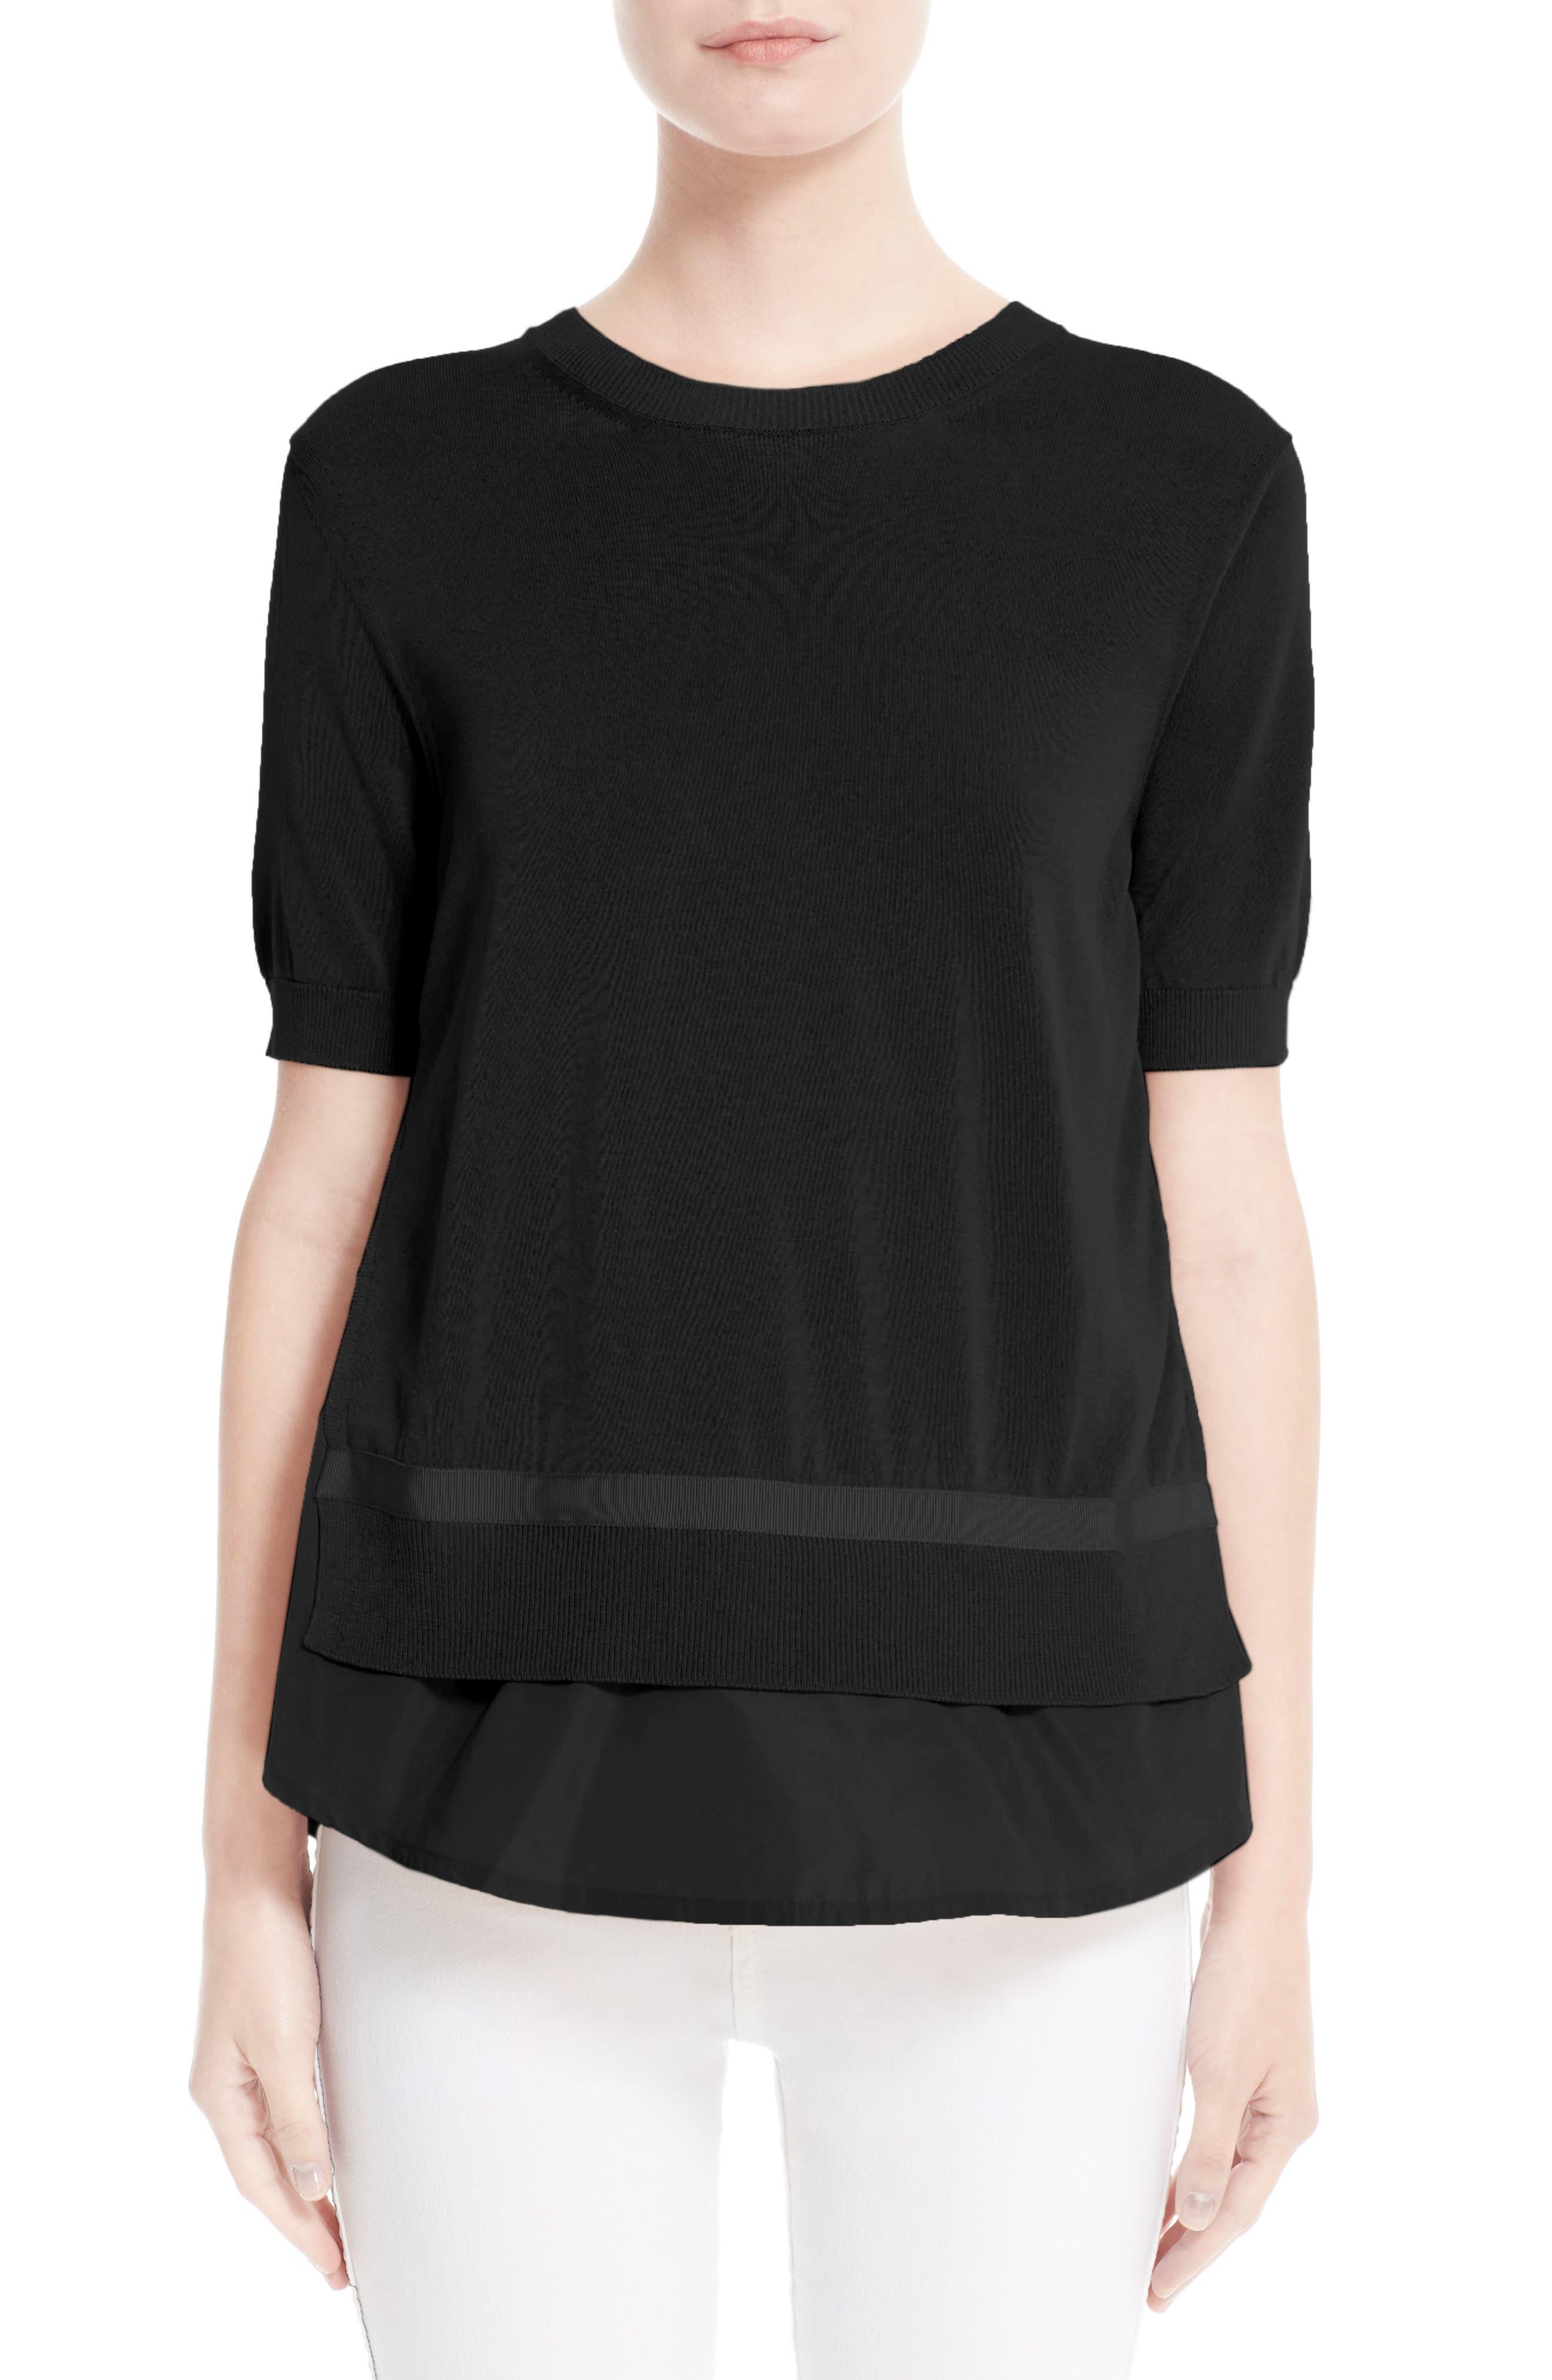 Tricot Knit Top,                         Main,                         color, BLACK